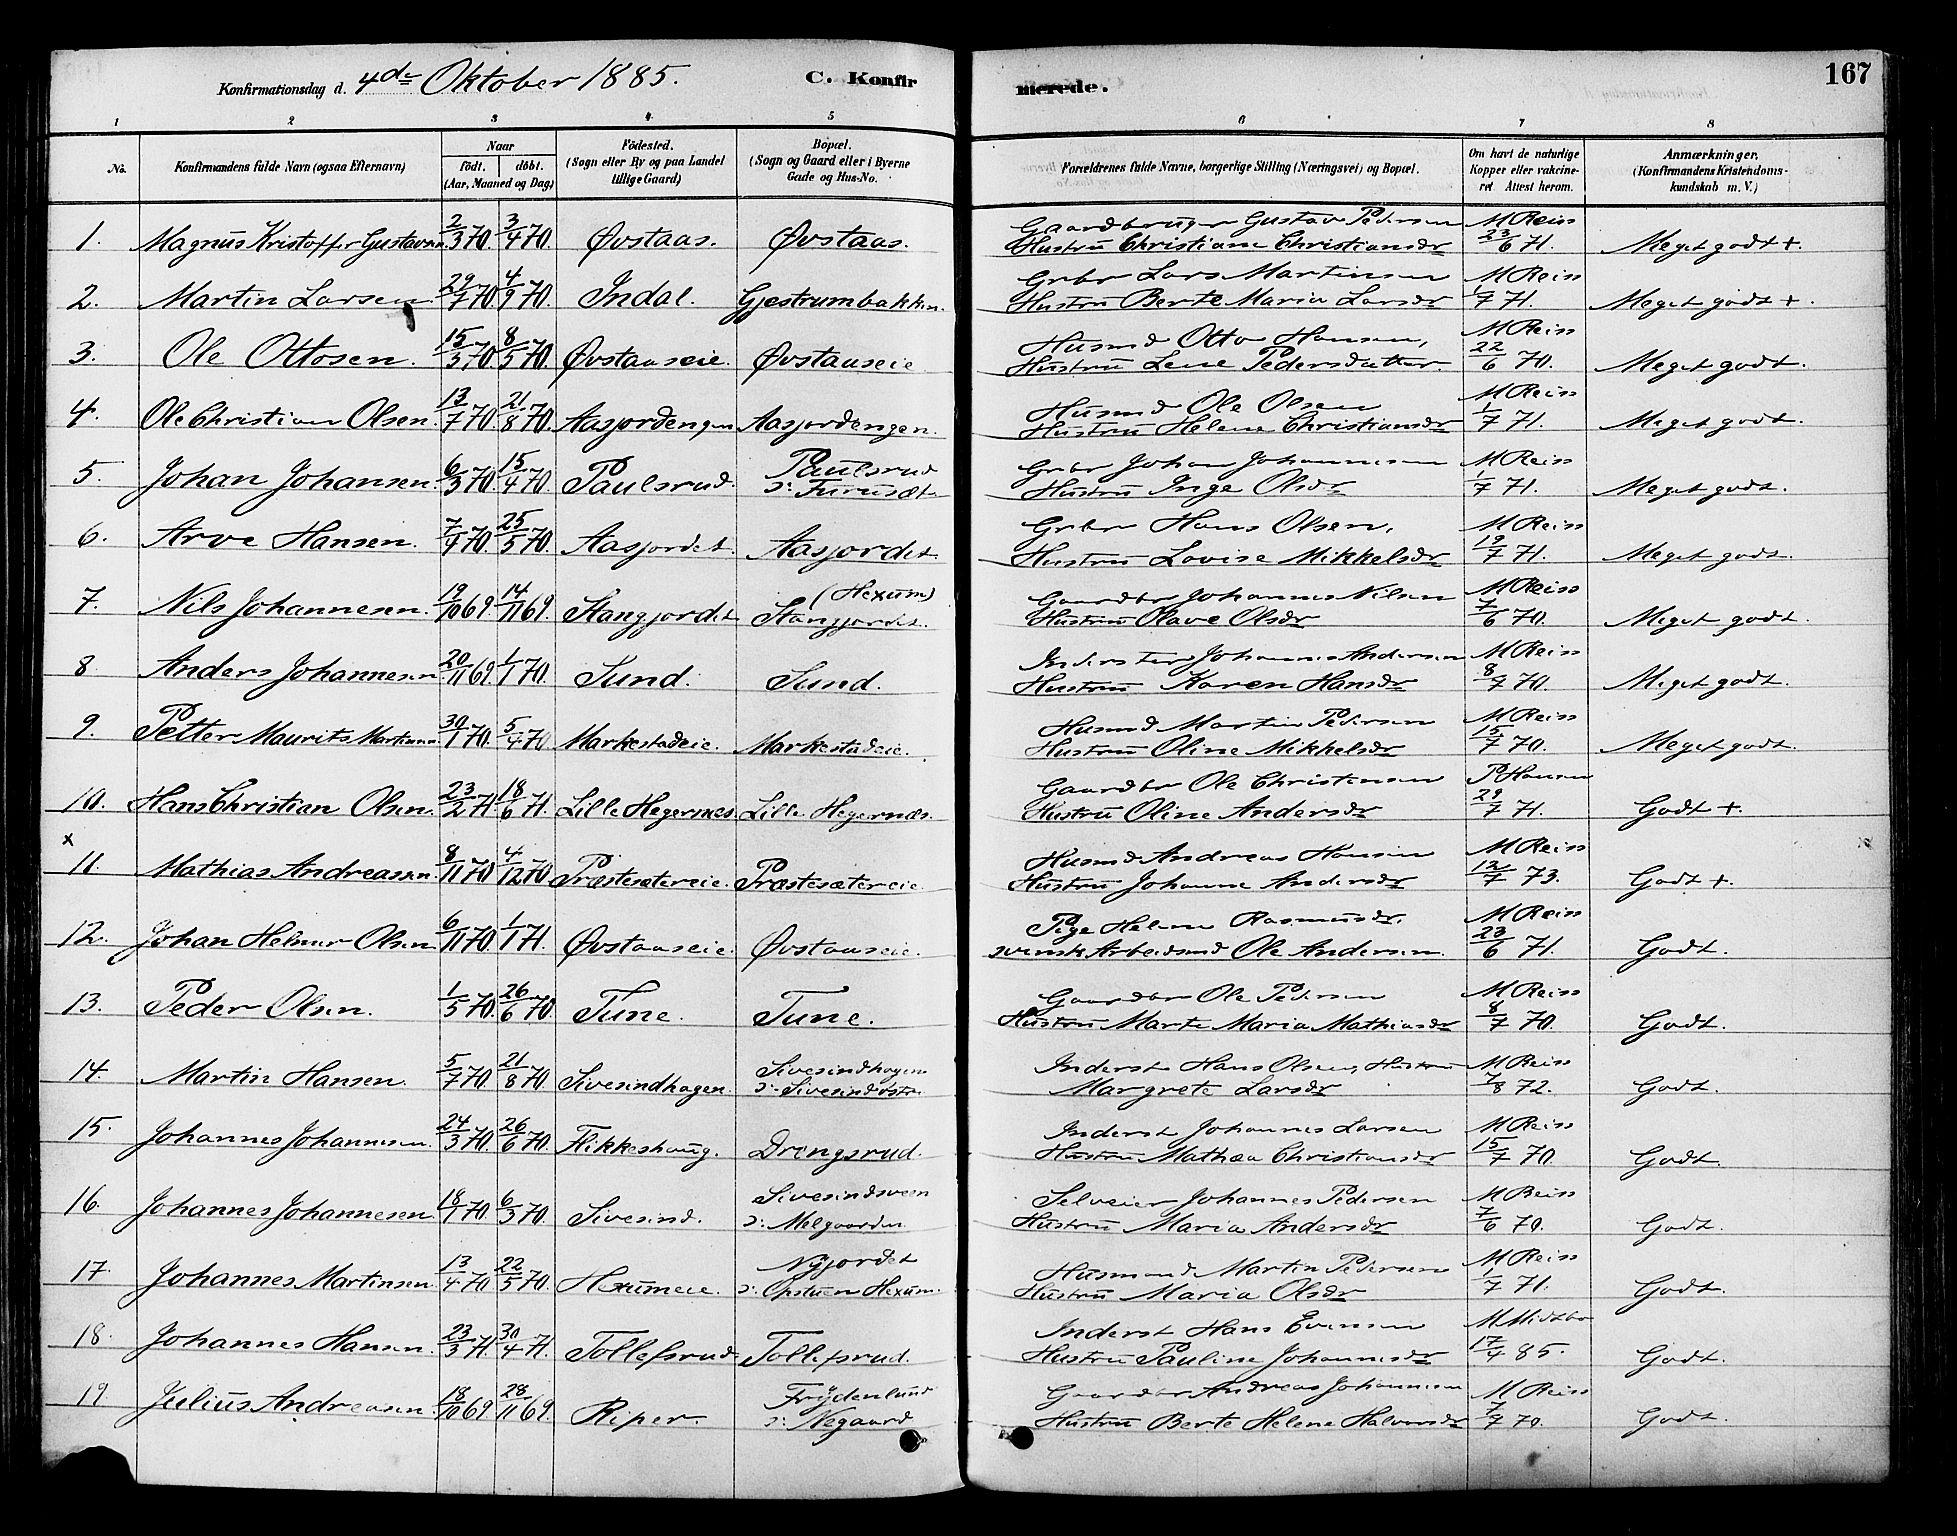 SAH, Vestre Toten prestekontor, H/Ha/Haa/L0009: Ministerialbok nr. 9, 1878-1894, s. 167